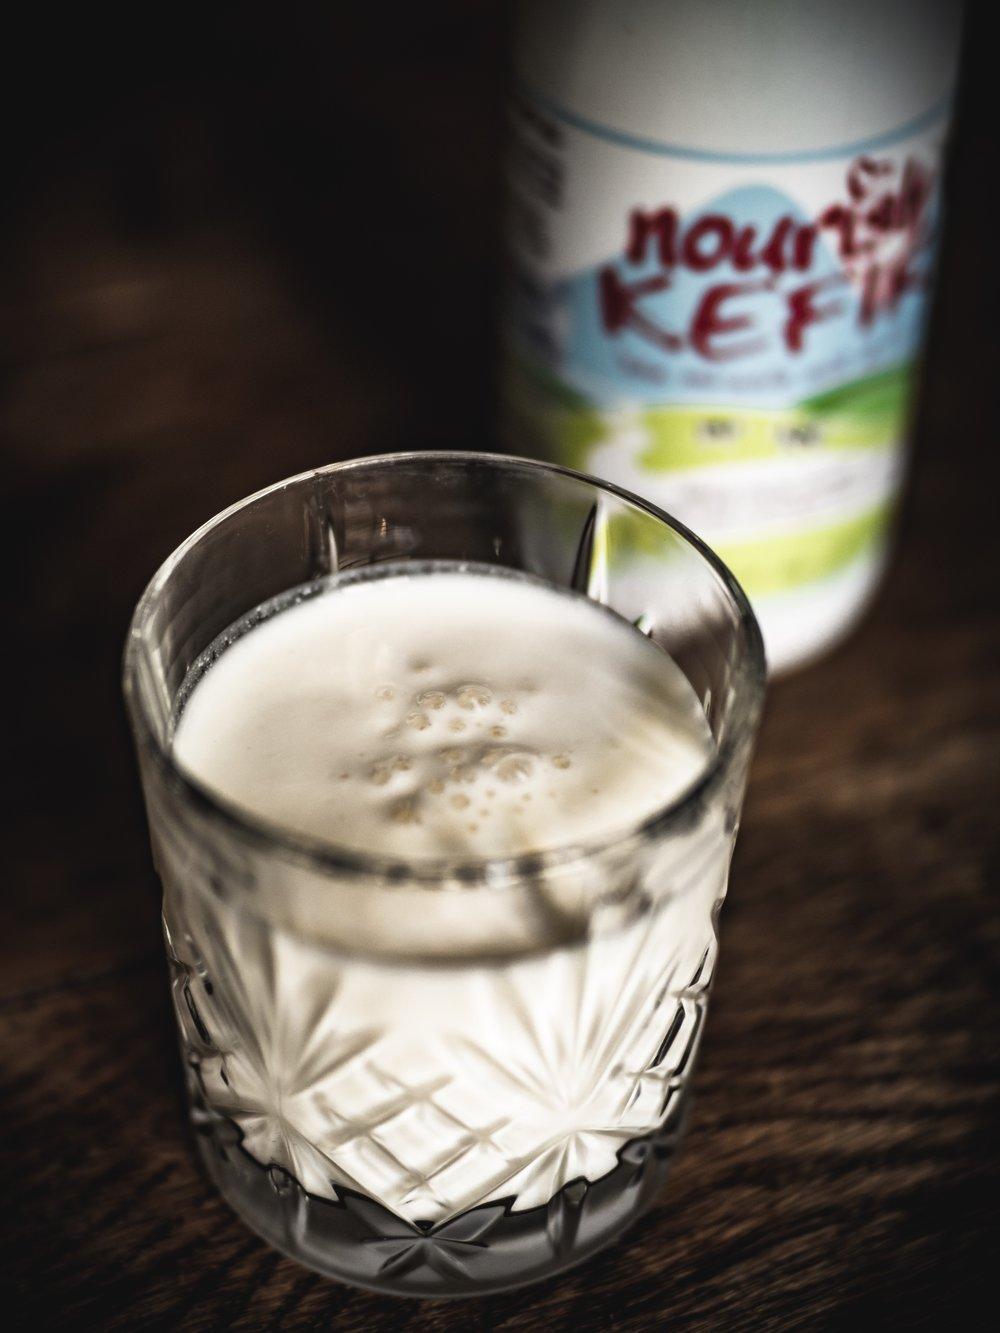 My first time drinking Kefir